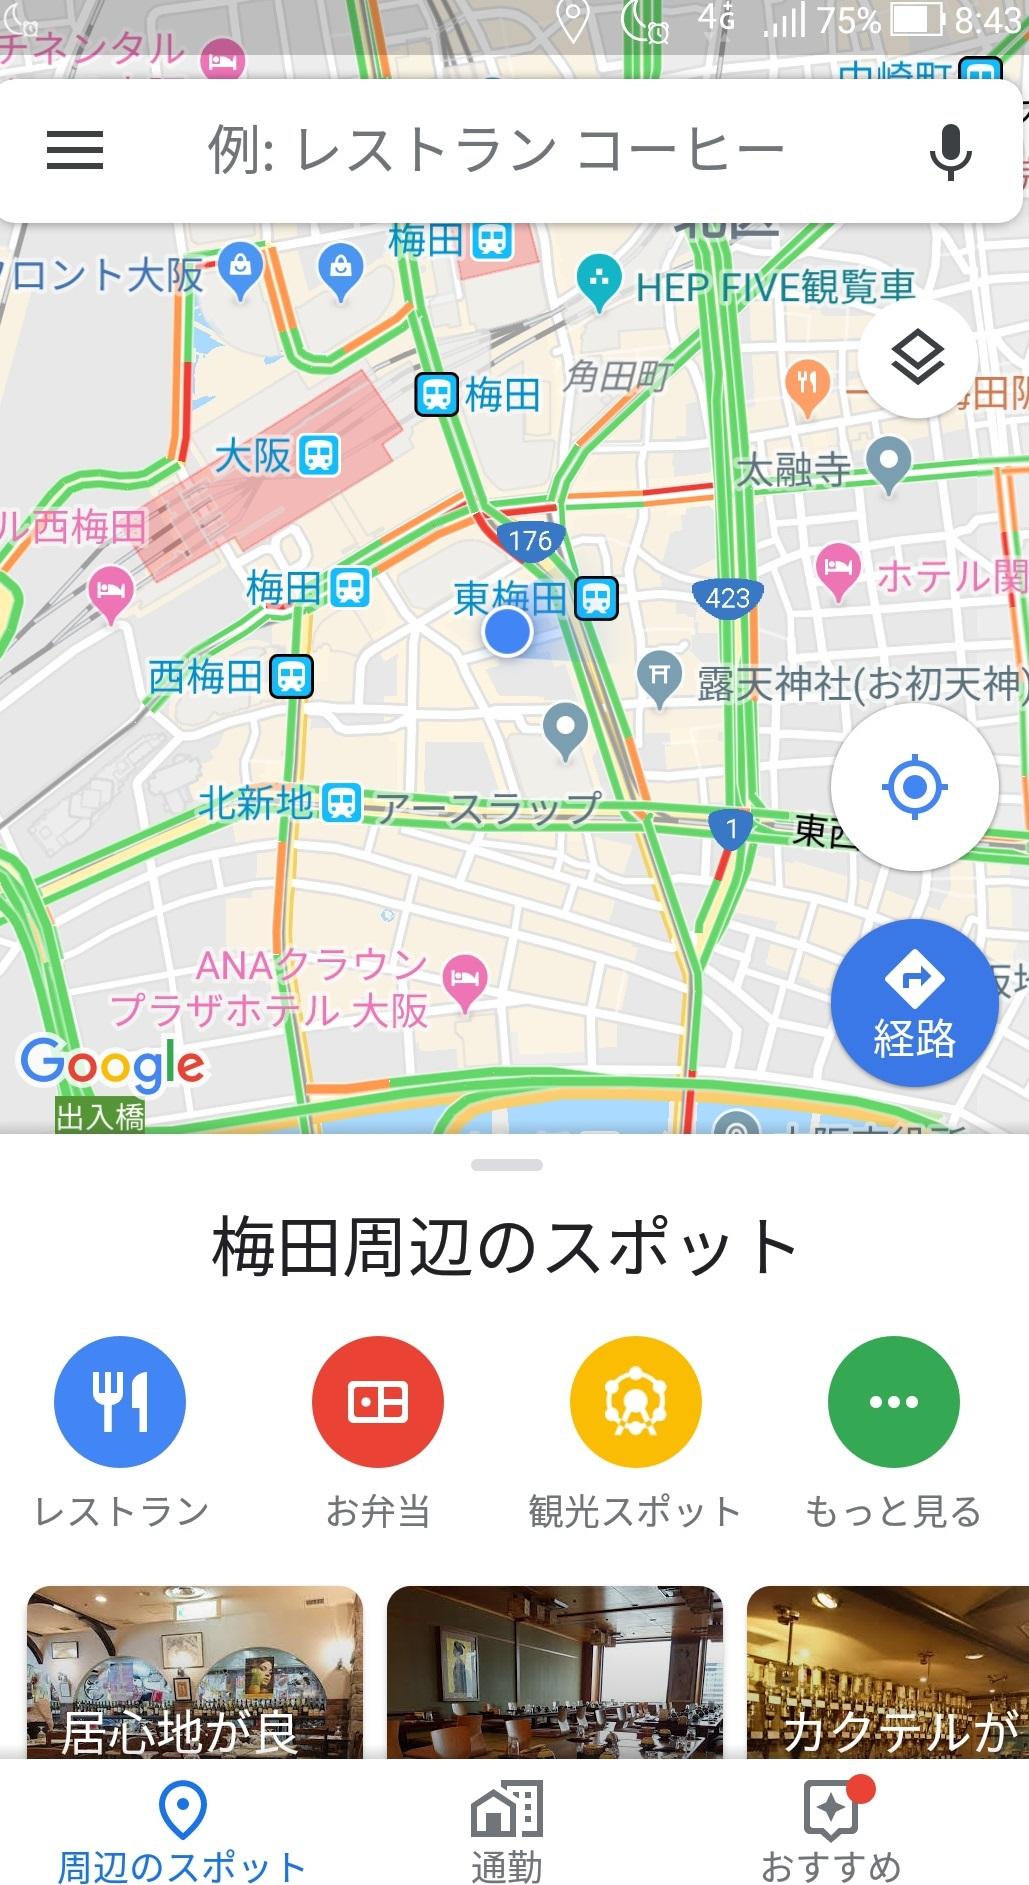 sumaho_genzaichi_search1.jpg